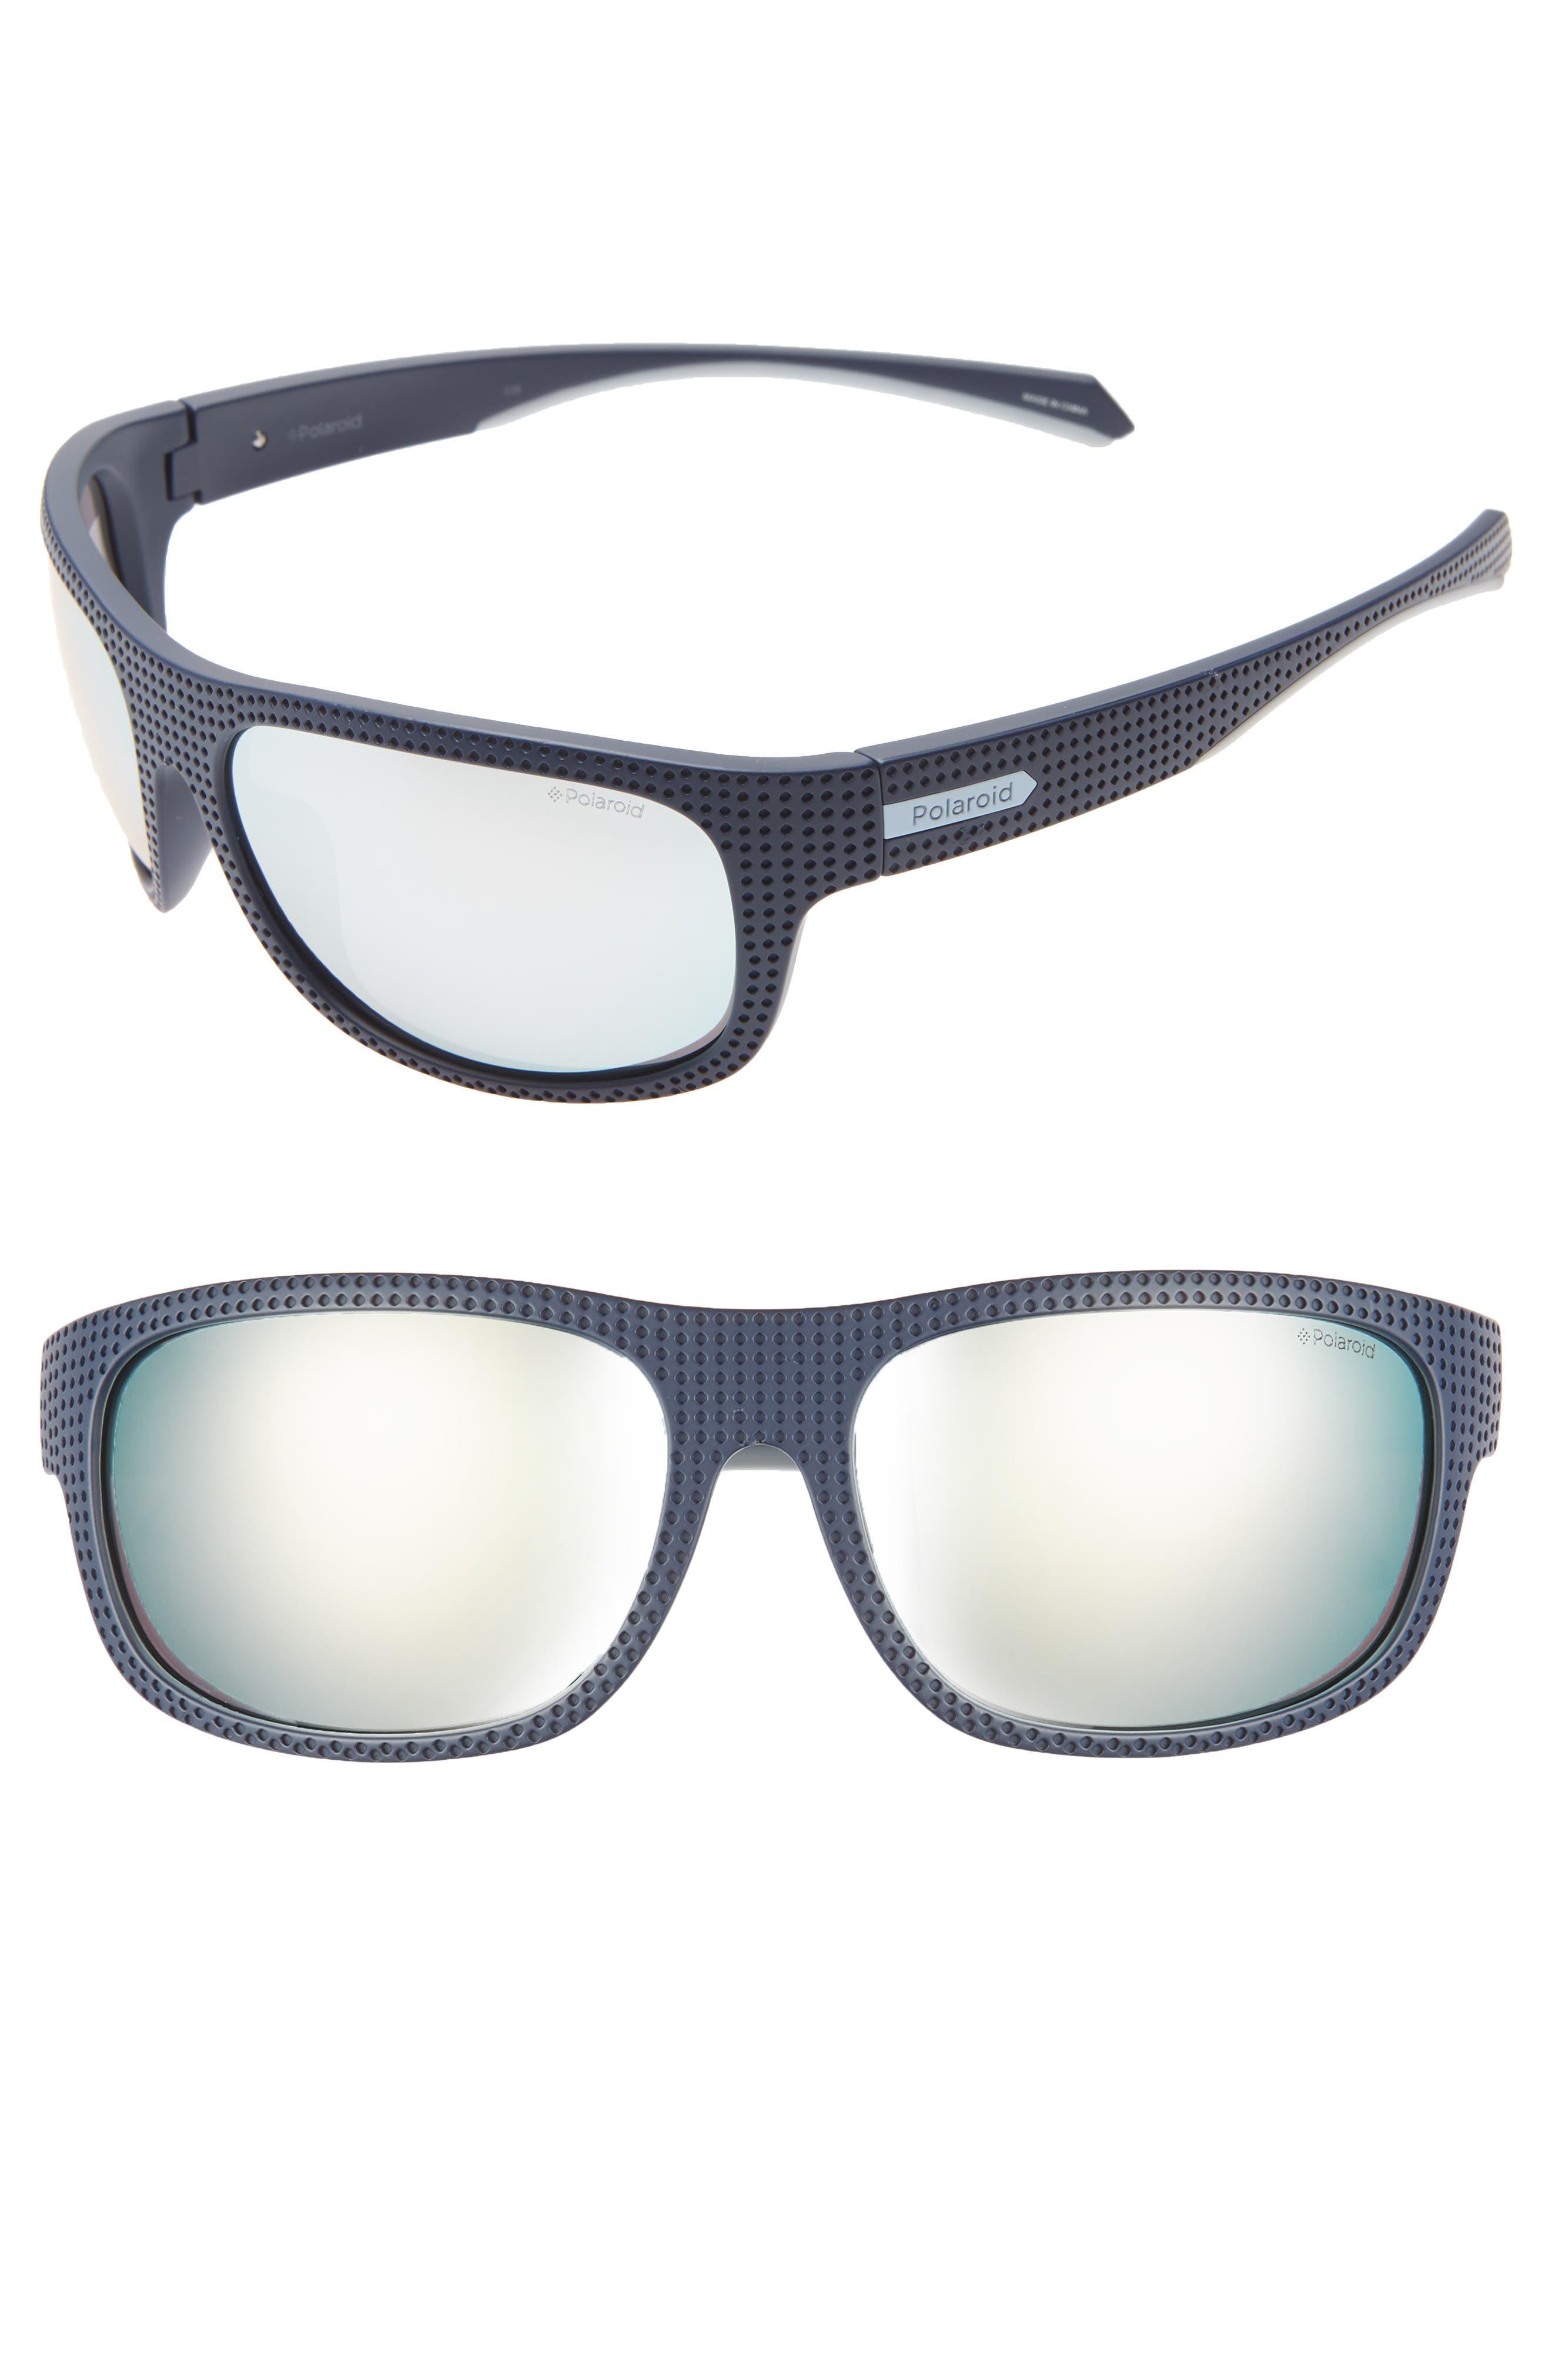 Polaroid Plastic Wrap 6m Polarized Sunglasses - Blue